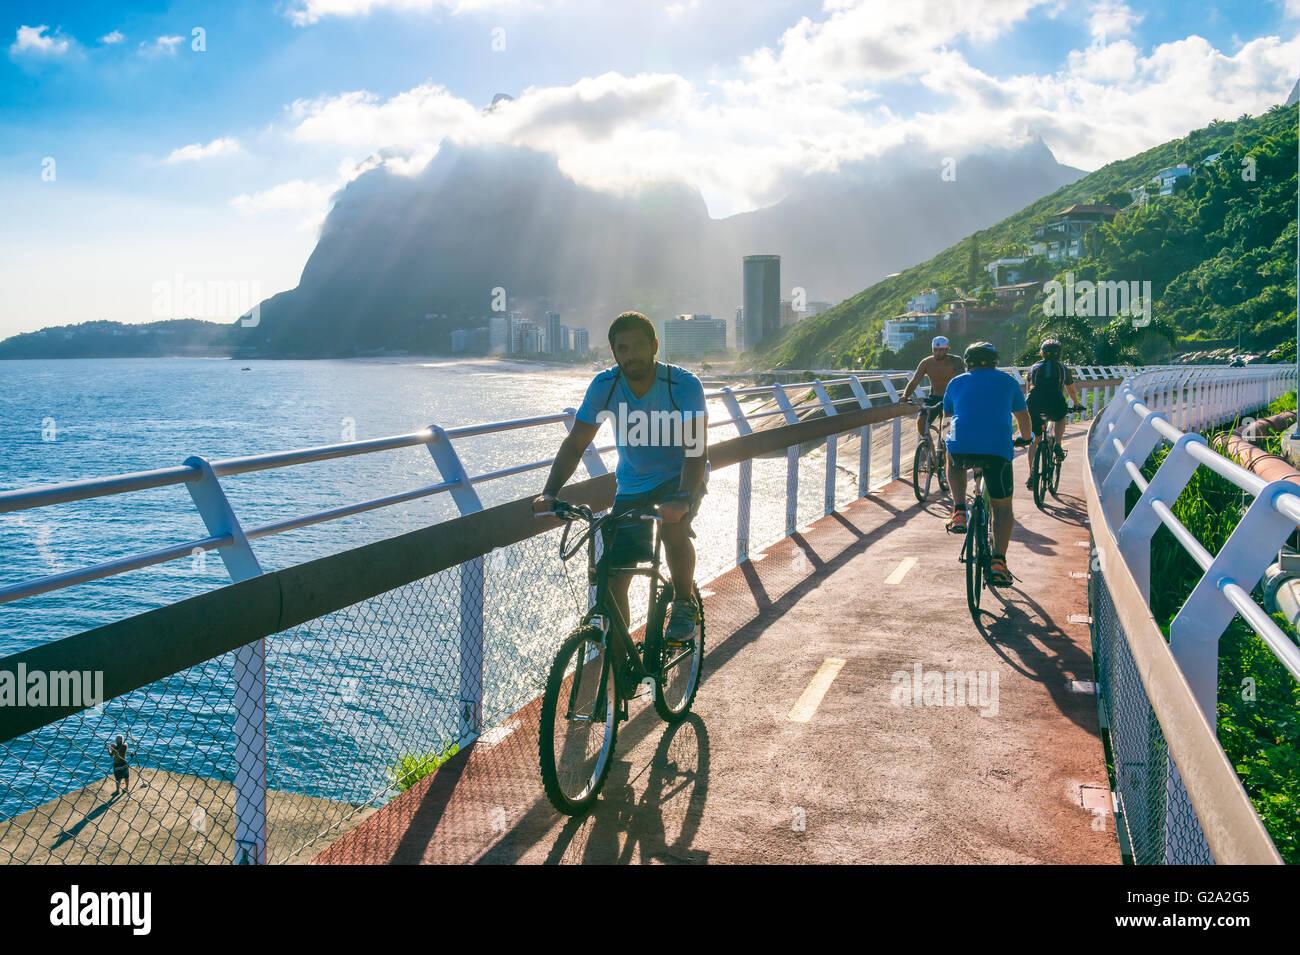 RIO DE JANEIRO - MARCH 19, 2016: Cyclists ride along the newly completed Ciclovia Tim Maia bike path, an Olympic - Stock Image